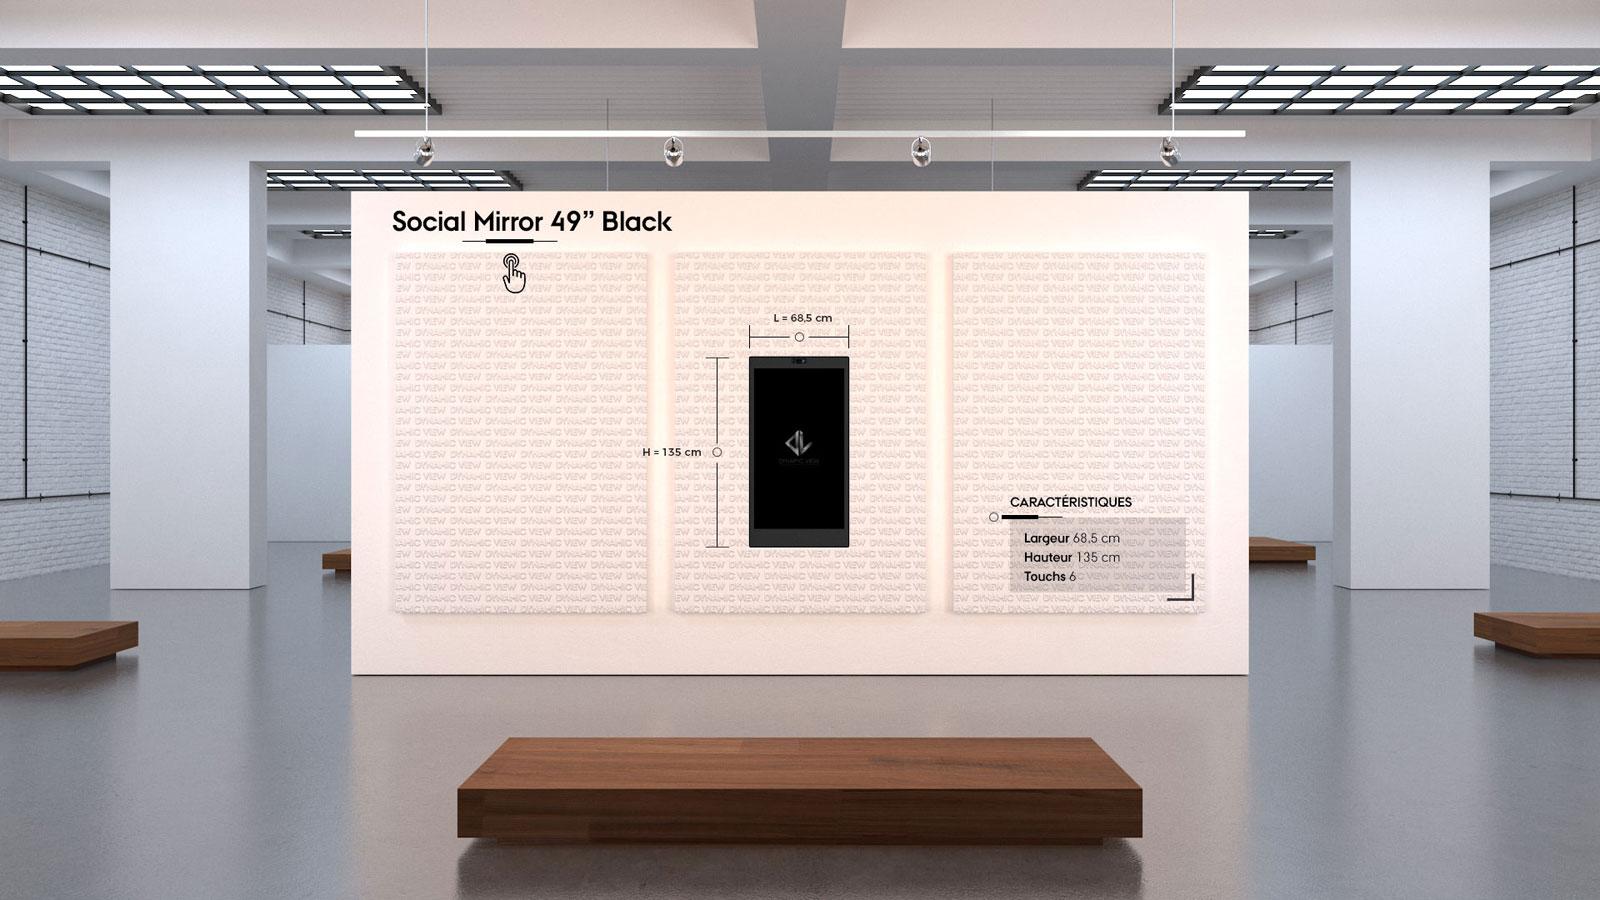 43 Social Mirror 49'' Black